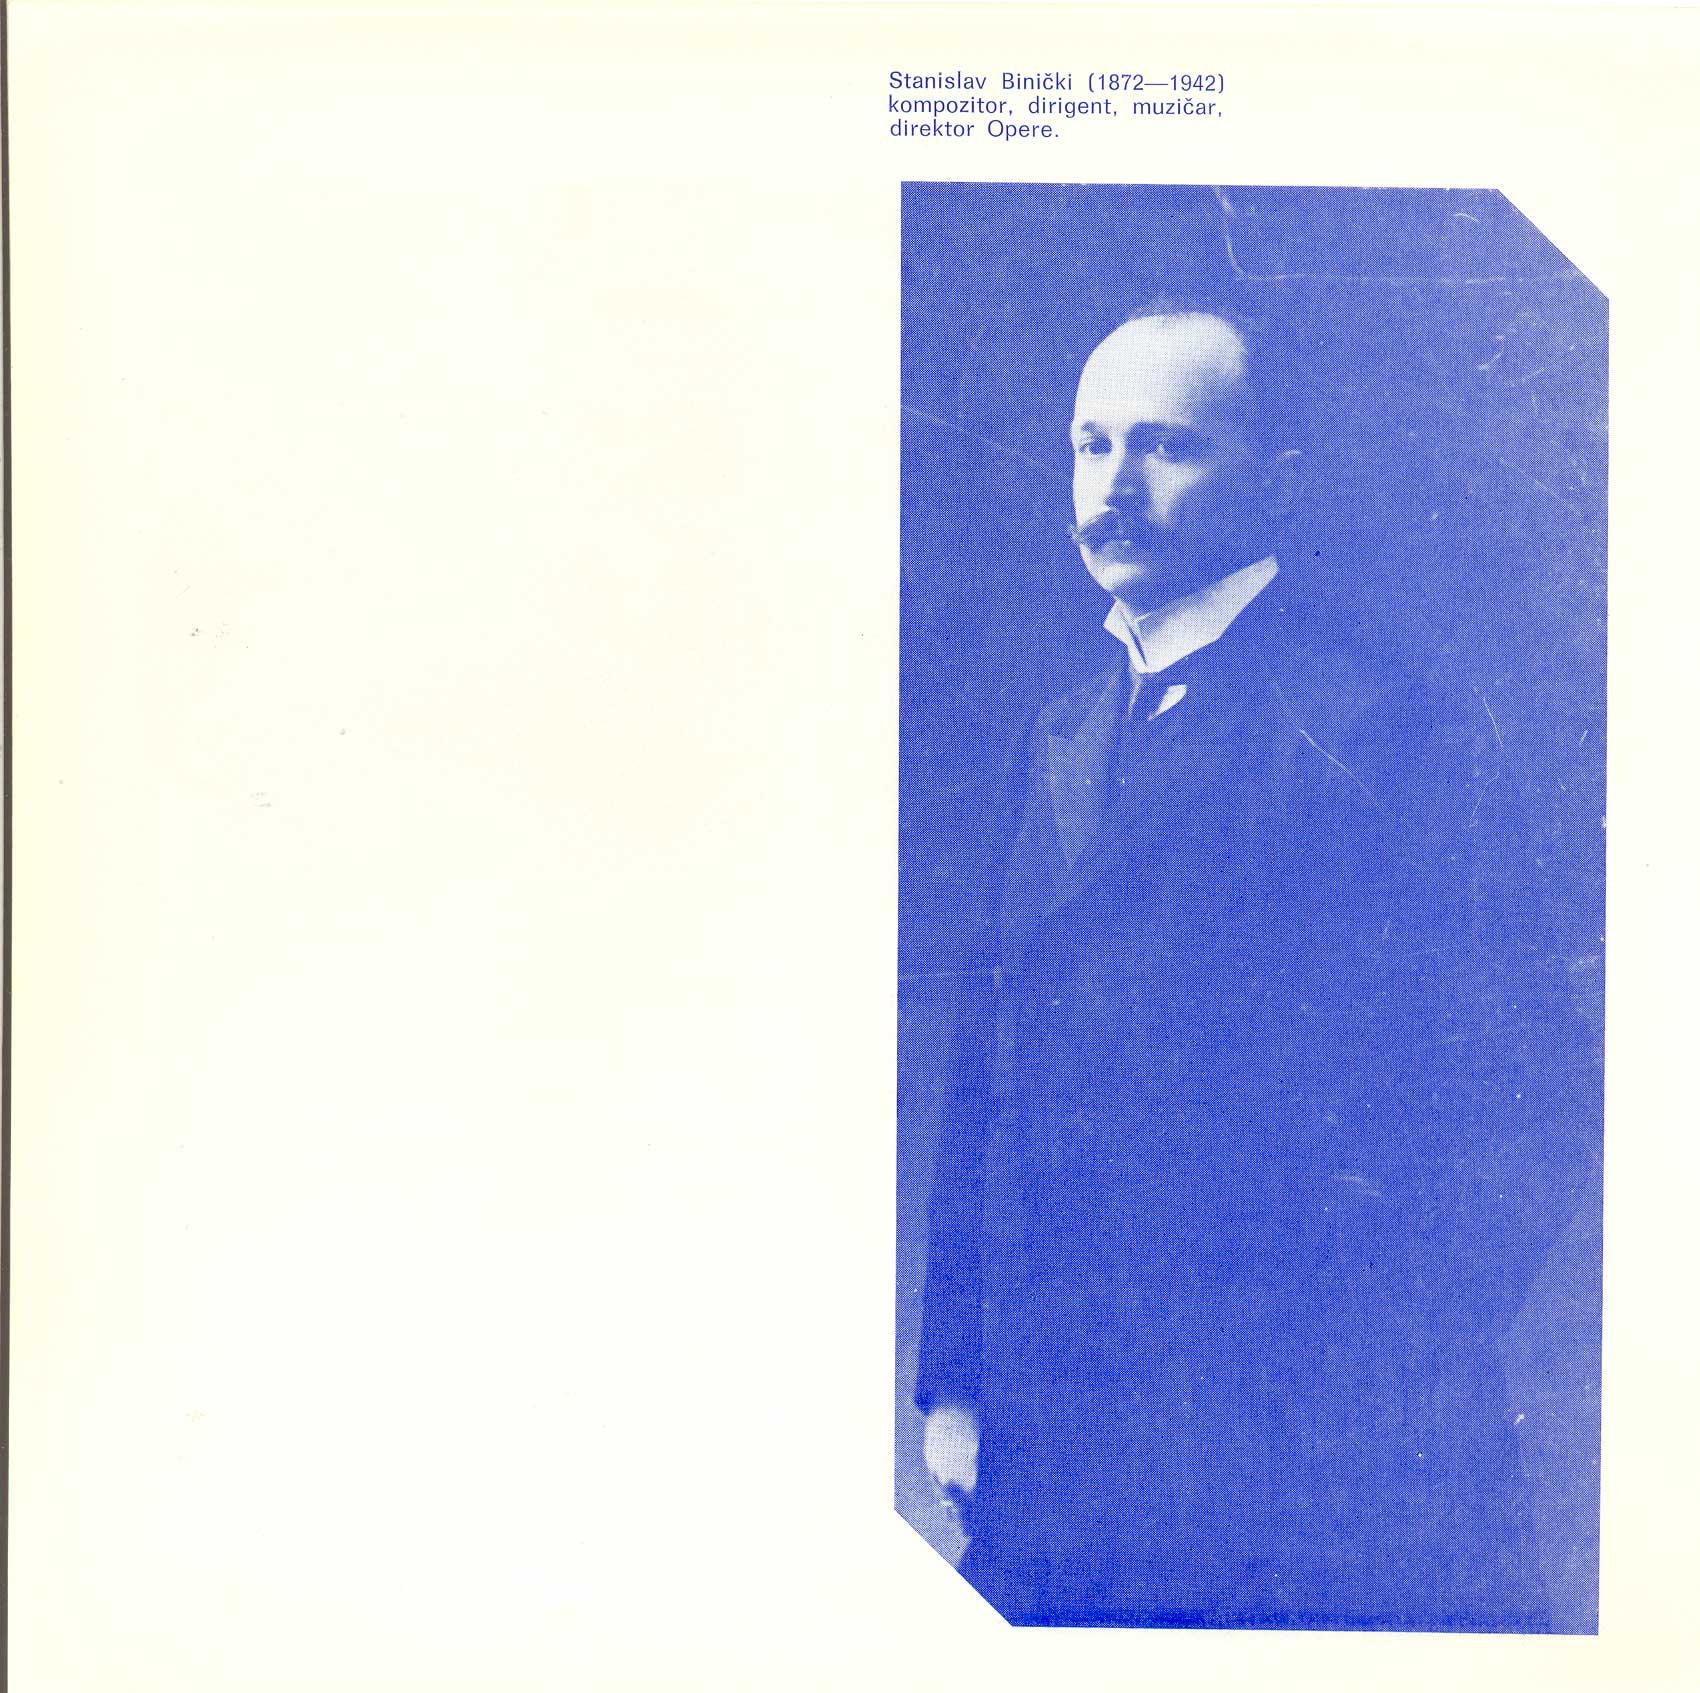 stanislav-binicki-katalog-1973-19